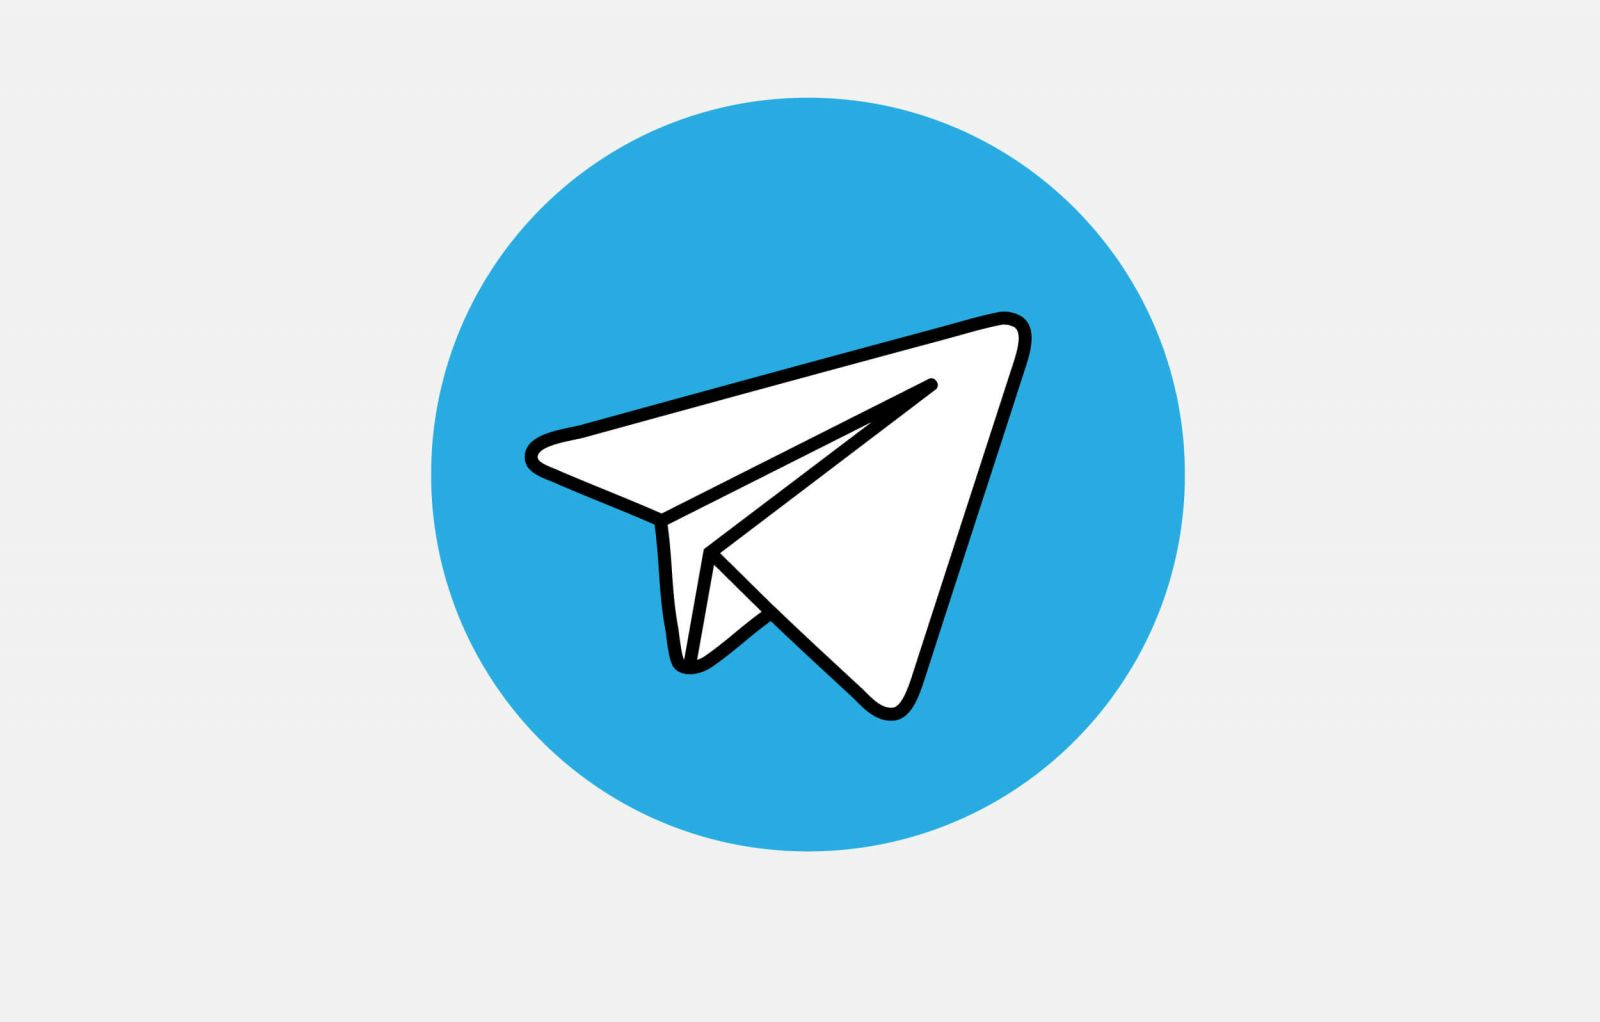 Smm-специалист телеграм